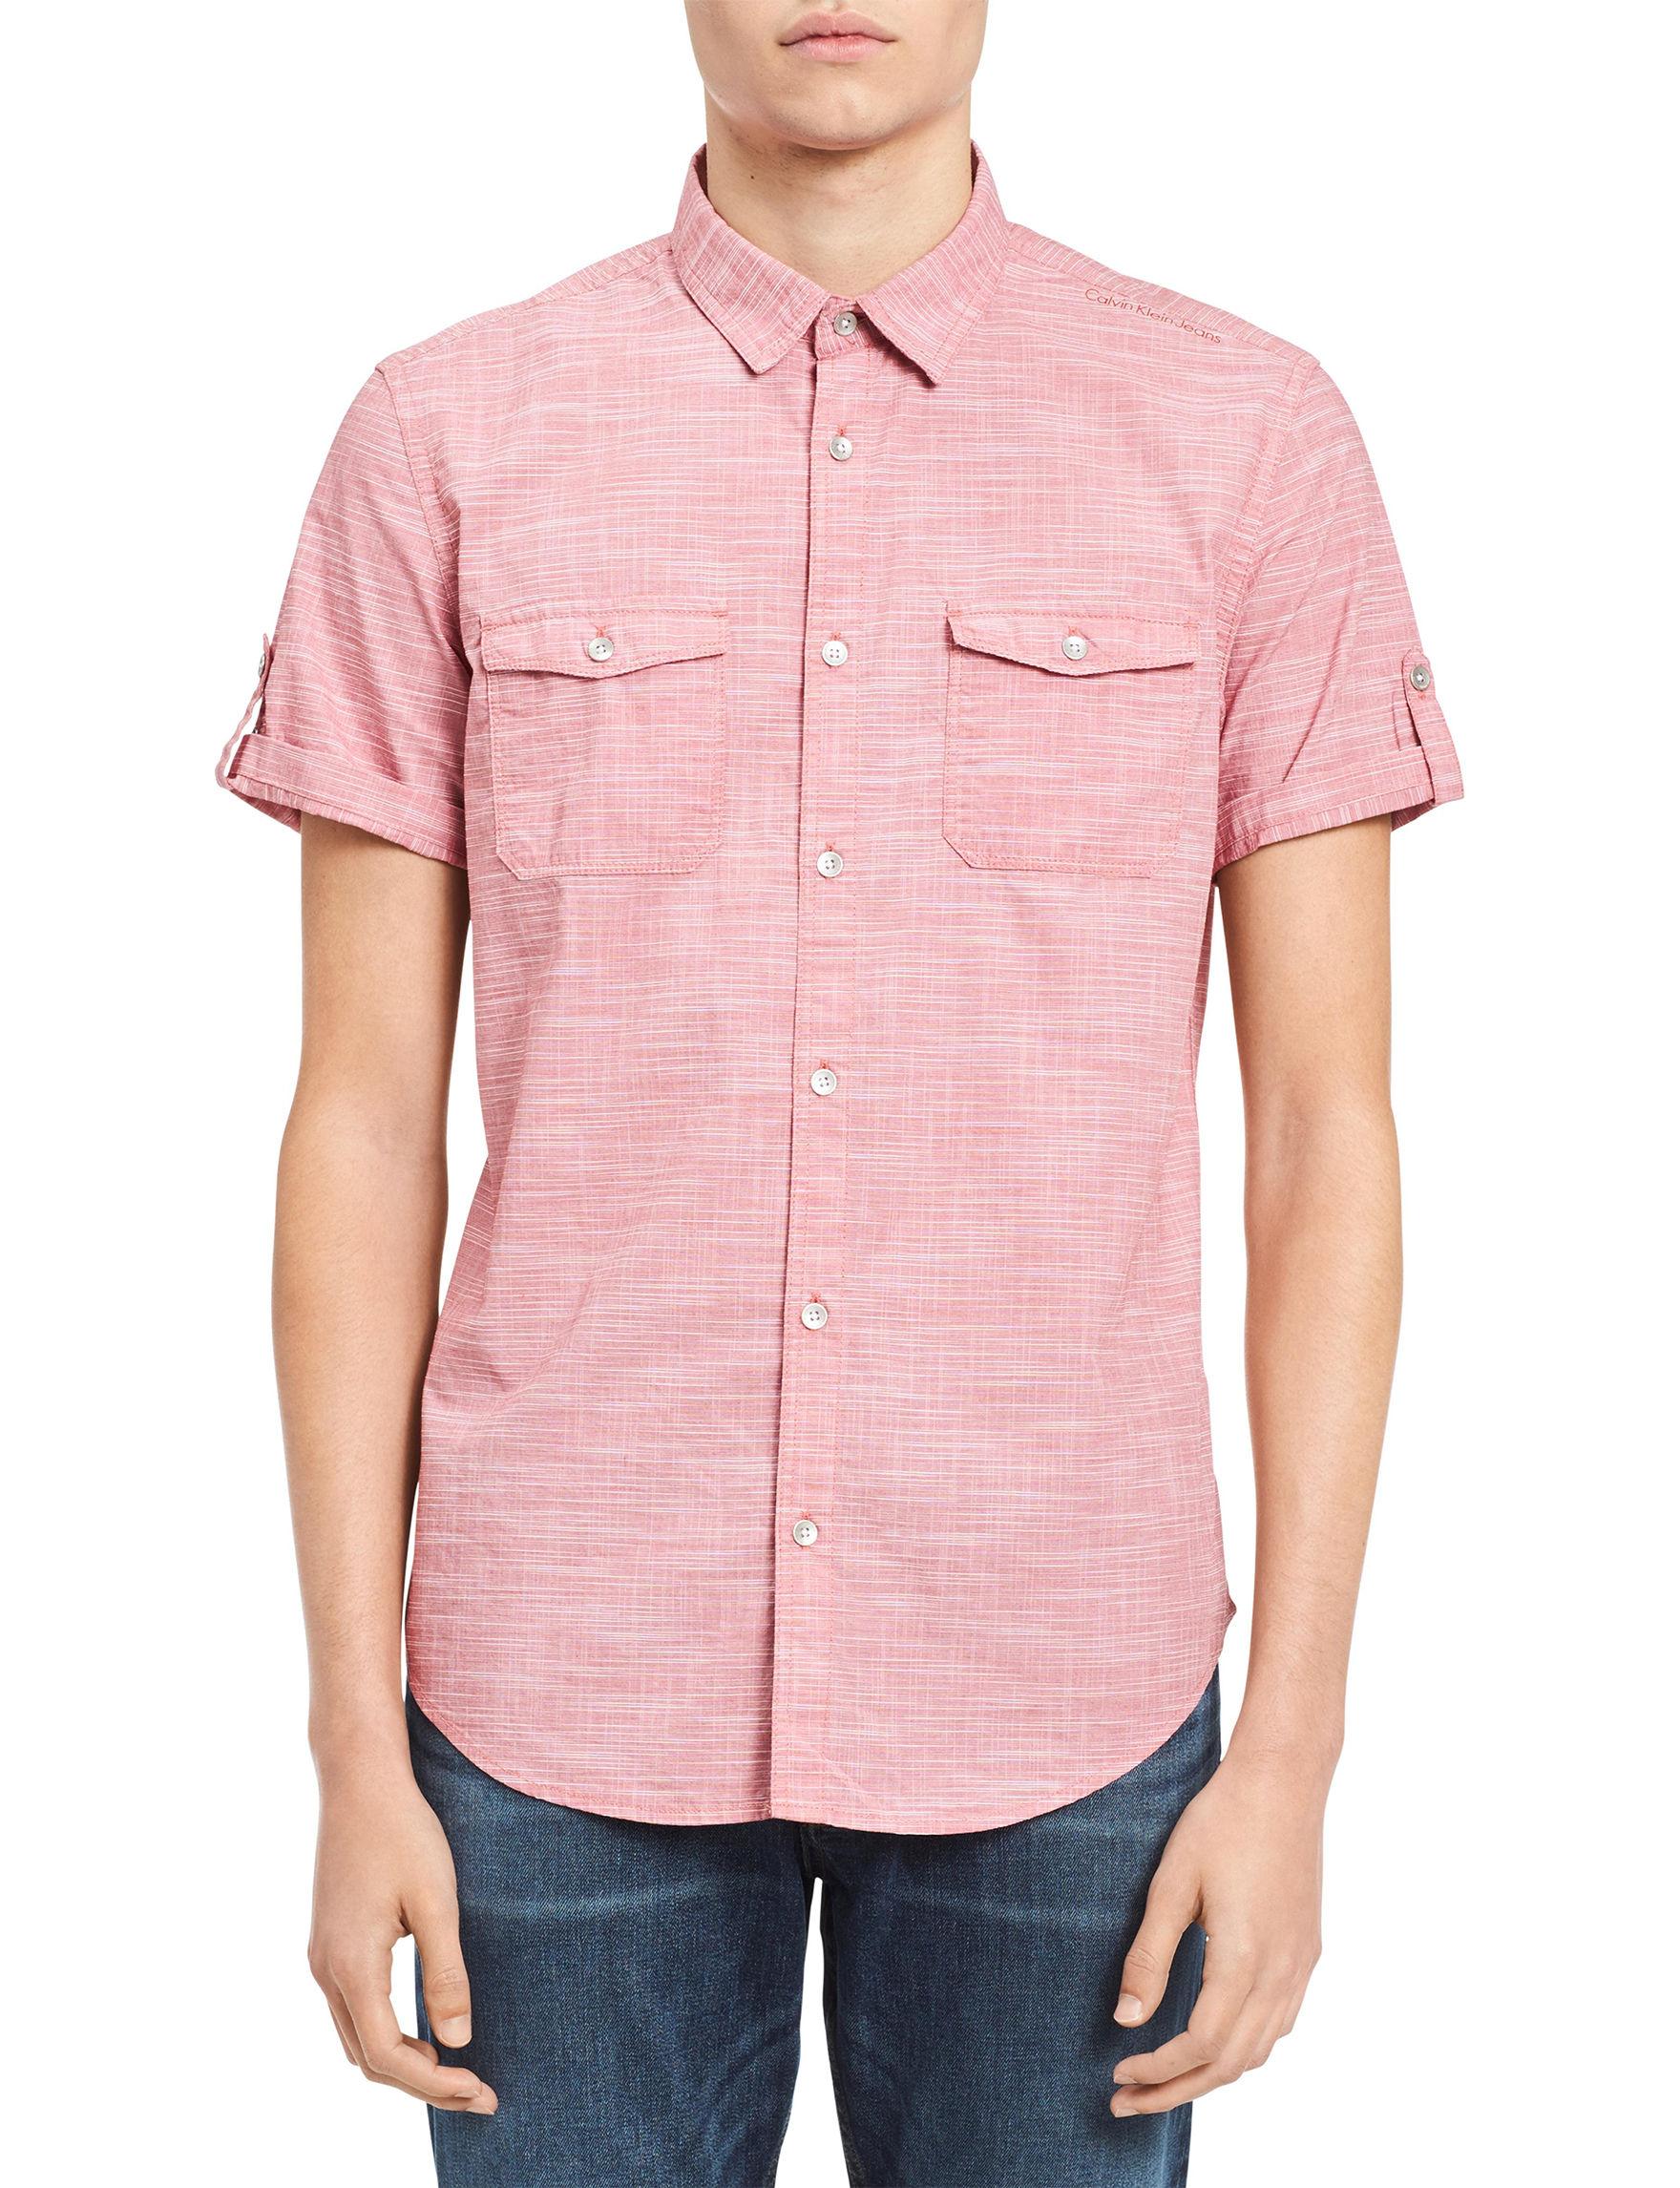 Calvin Klein Red Casual Button Down Shirts Dress Shirts